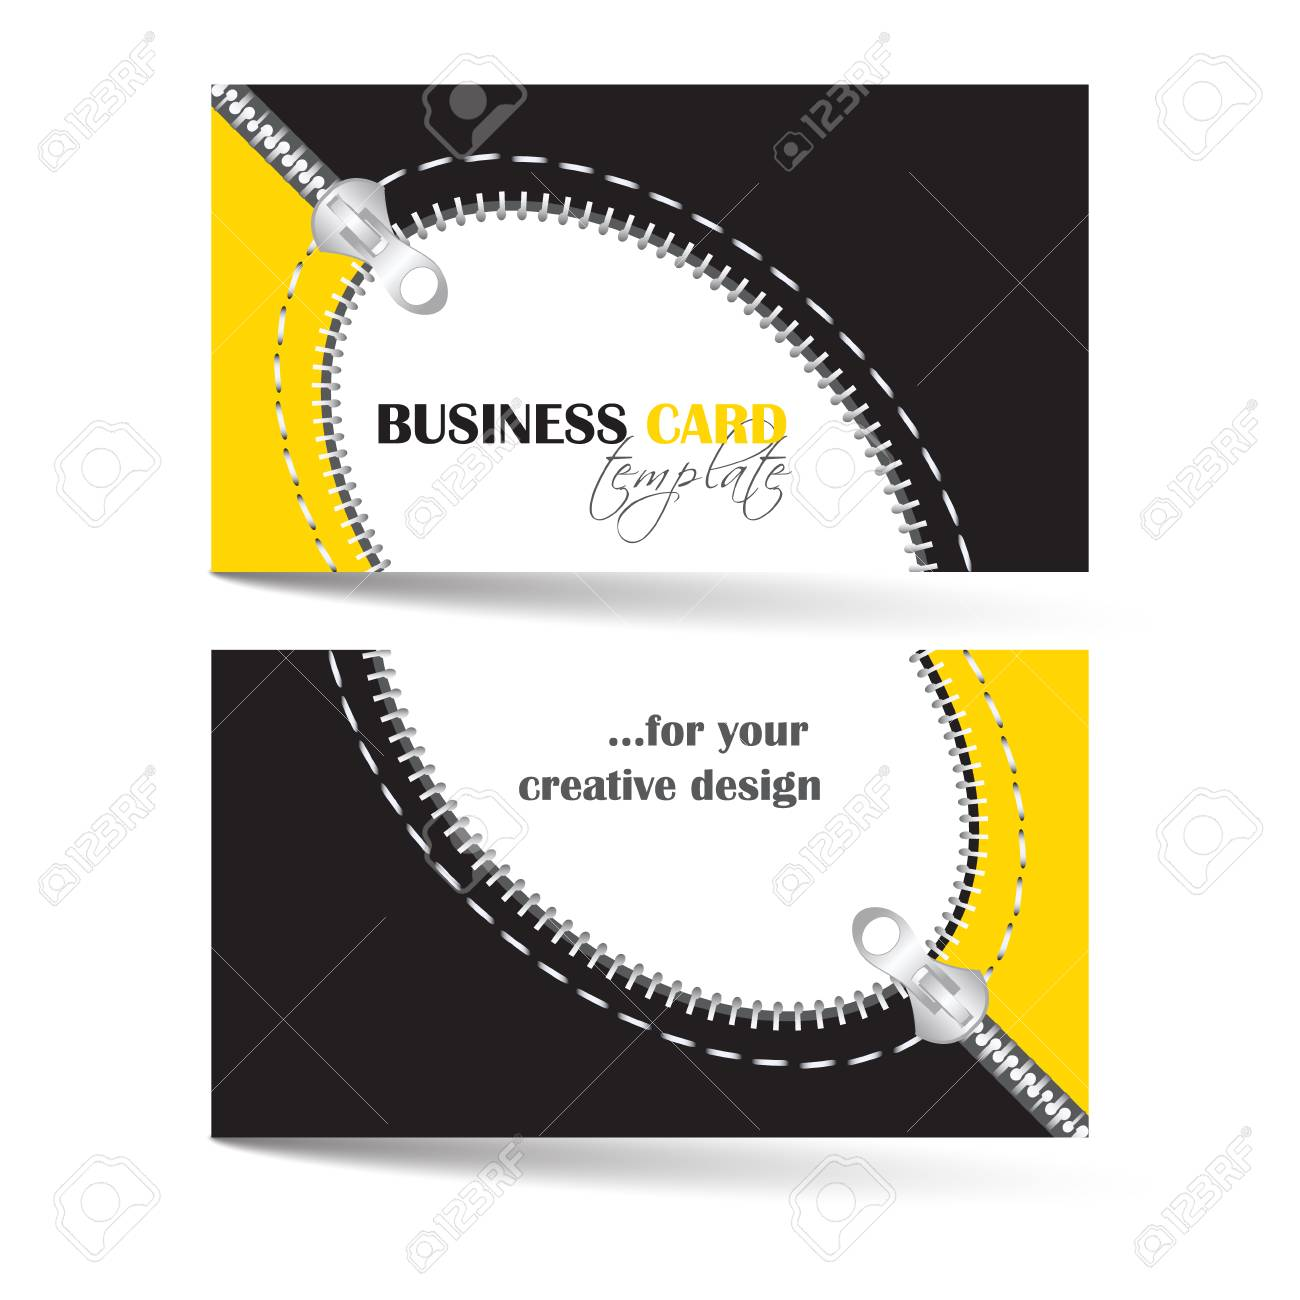 Modele De Carte Visite Creative Avec Zip Arc Peut Etre Utilise